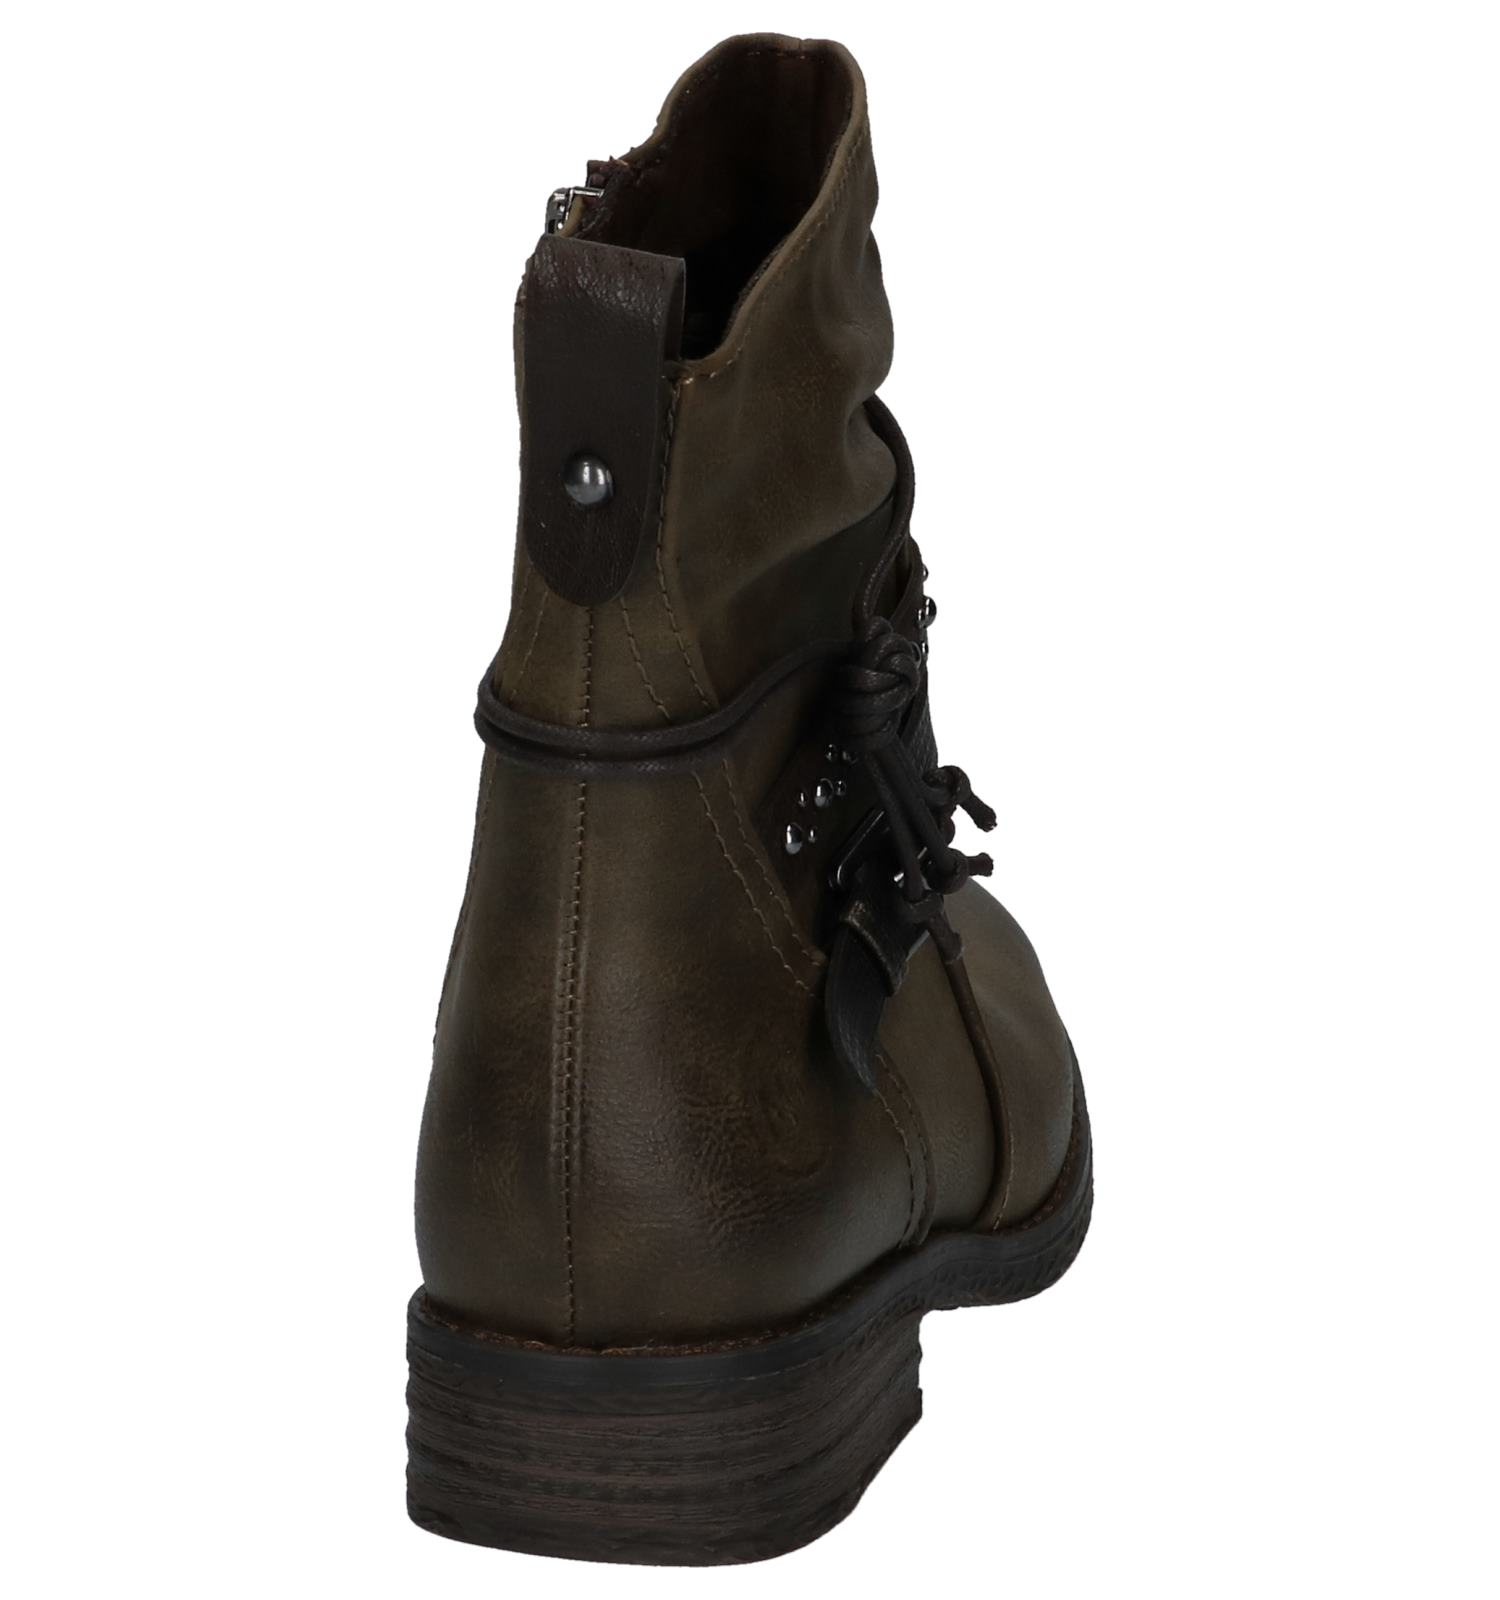 Marco Tozzi Kaki Met Studs Boots 0vN8wmn